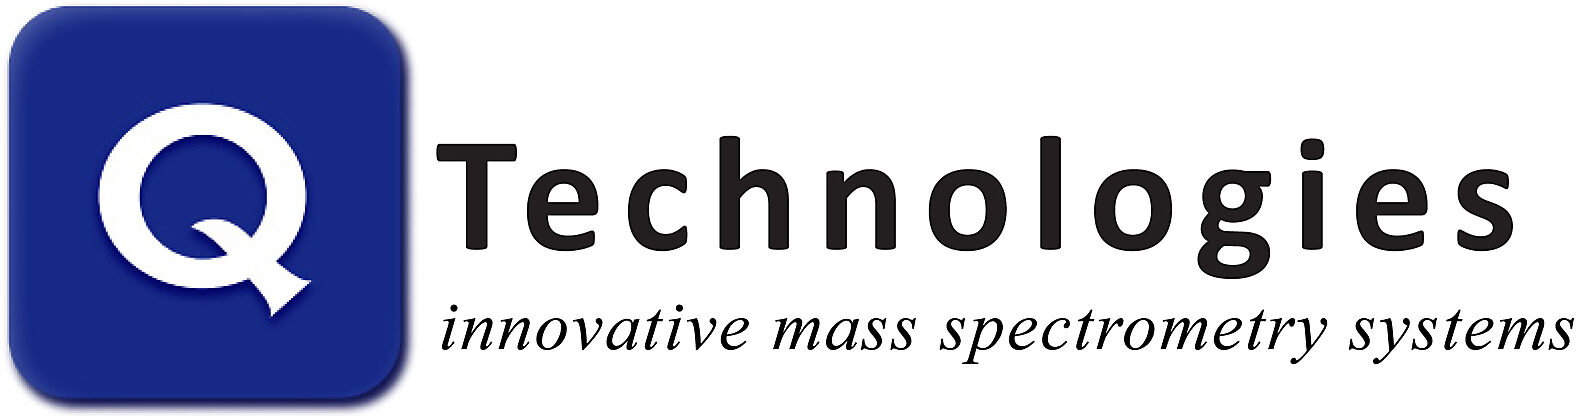 q-technologies